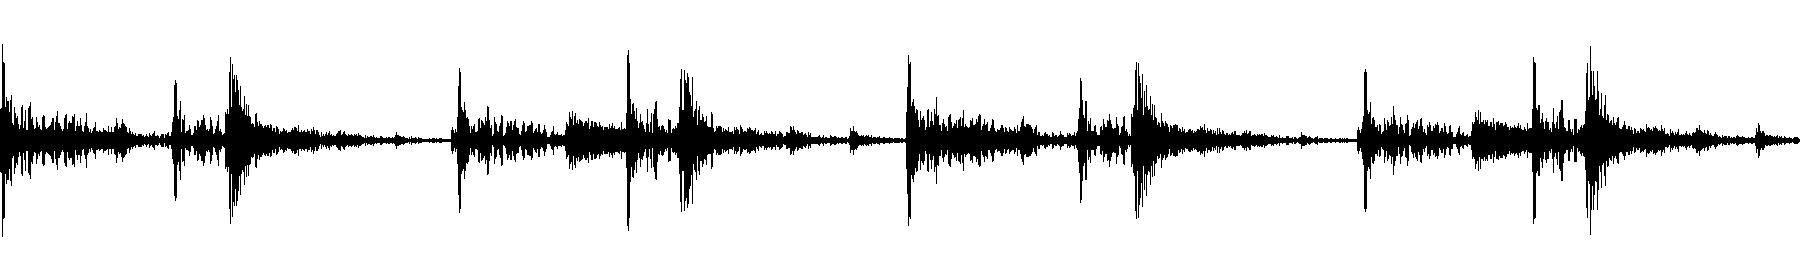 blbc jazzydrums 95 03